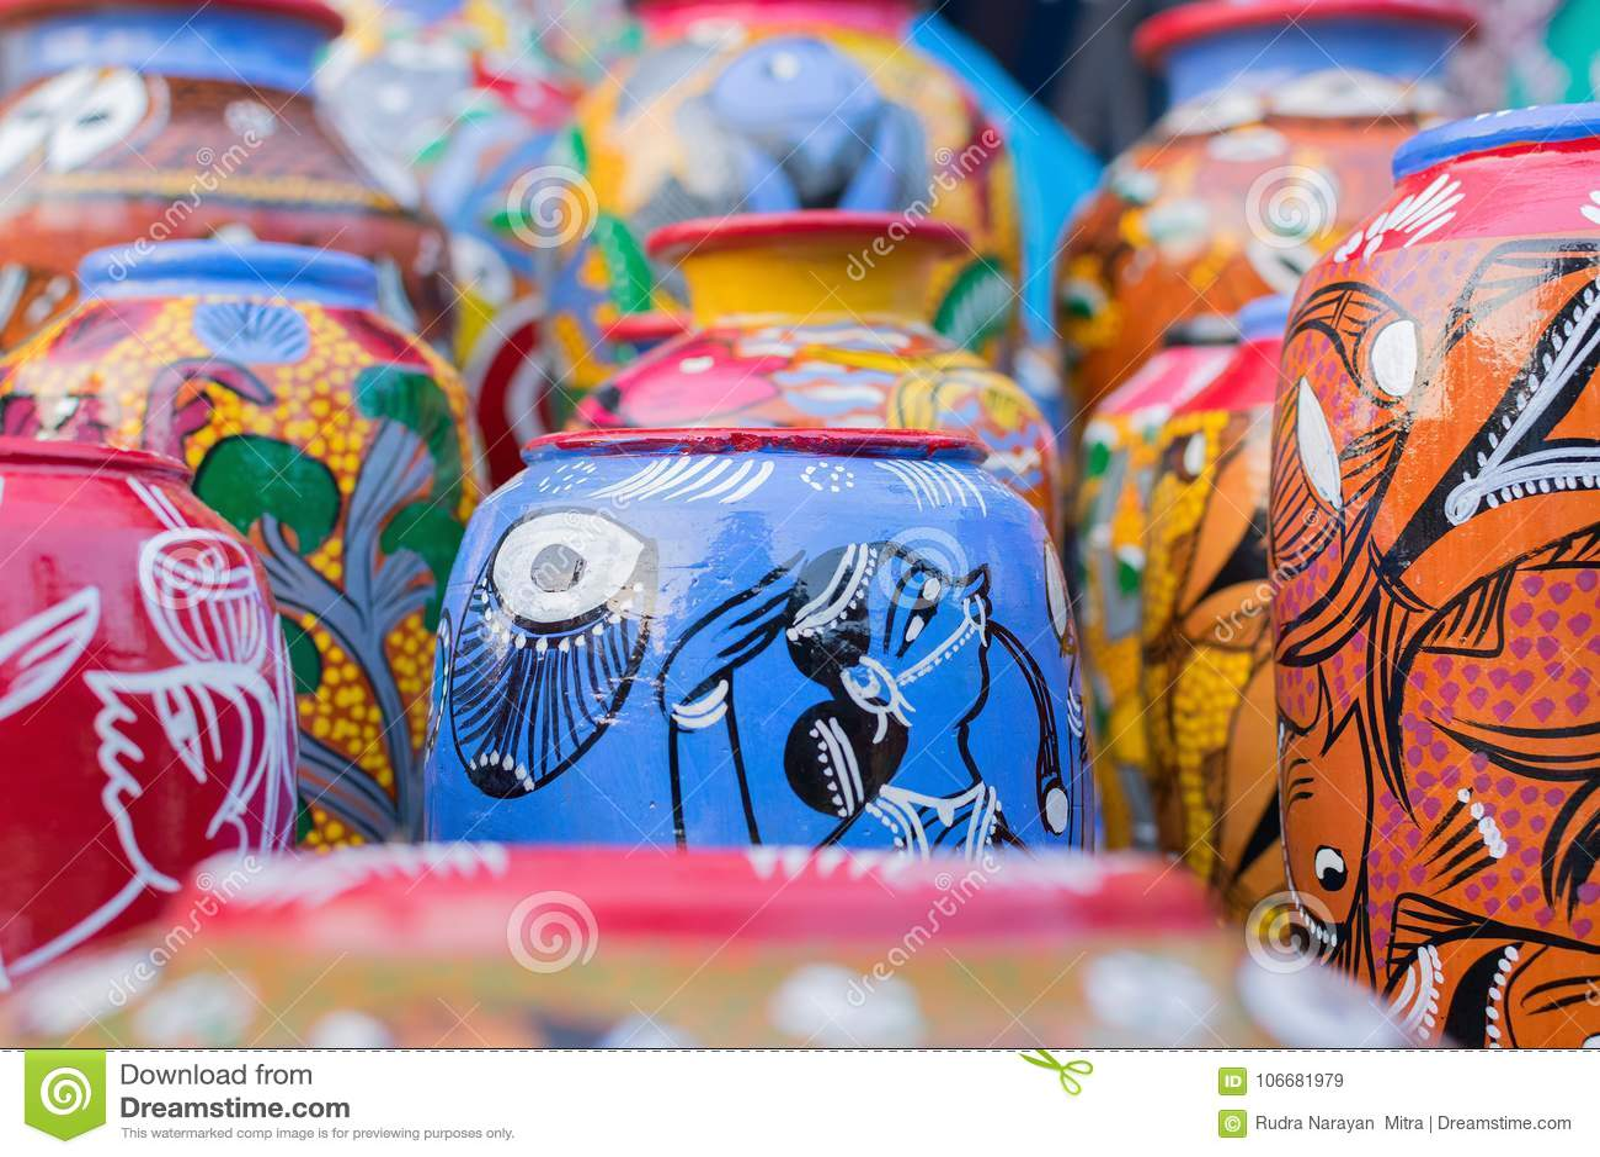 Terracotta Pots Indian Handicrafts Fair At Kolkata Stock Image